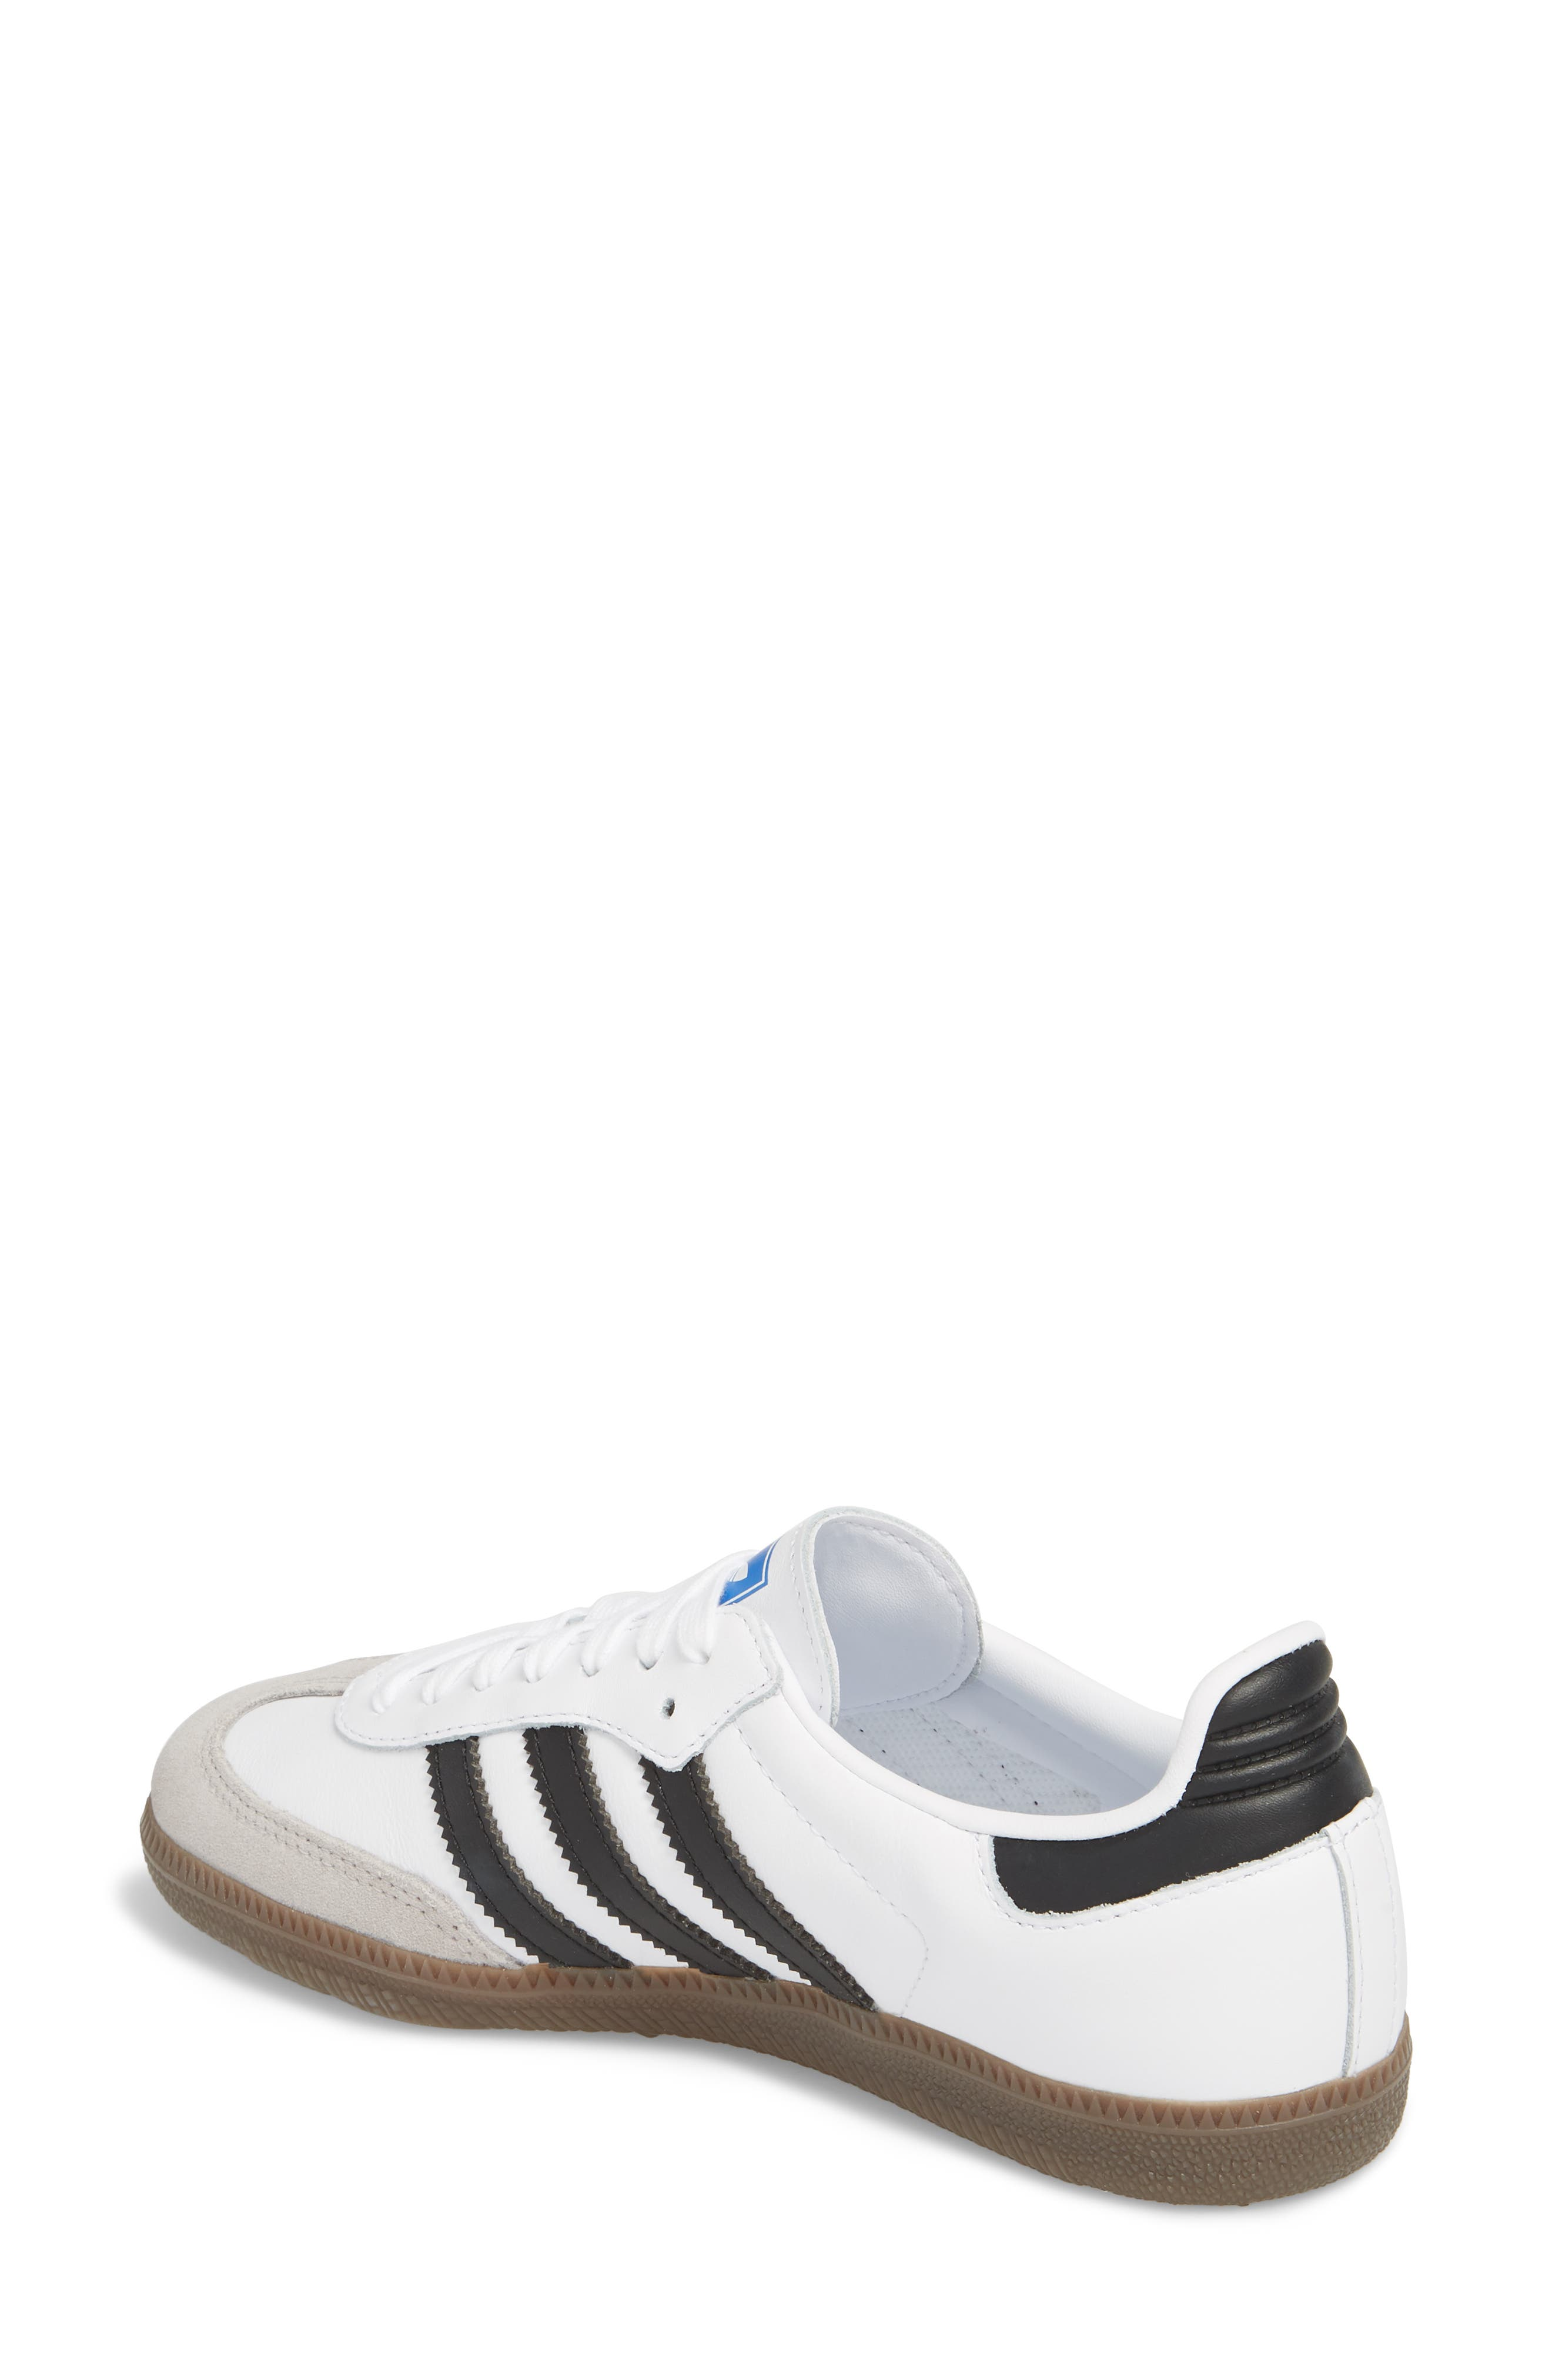 'Samba' Sneaker,                             Alternate thumbnail 2, color,                             White/ Black/ Clear Granite